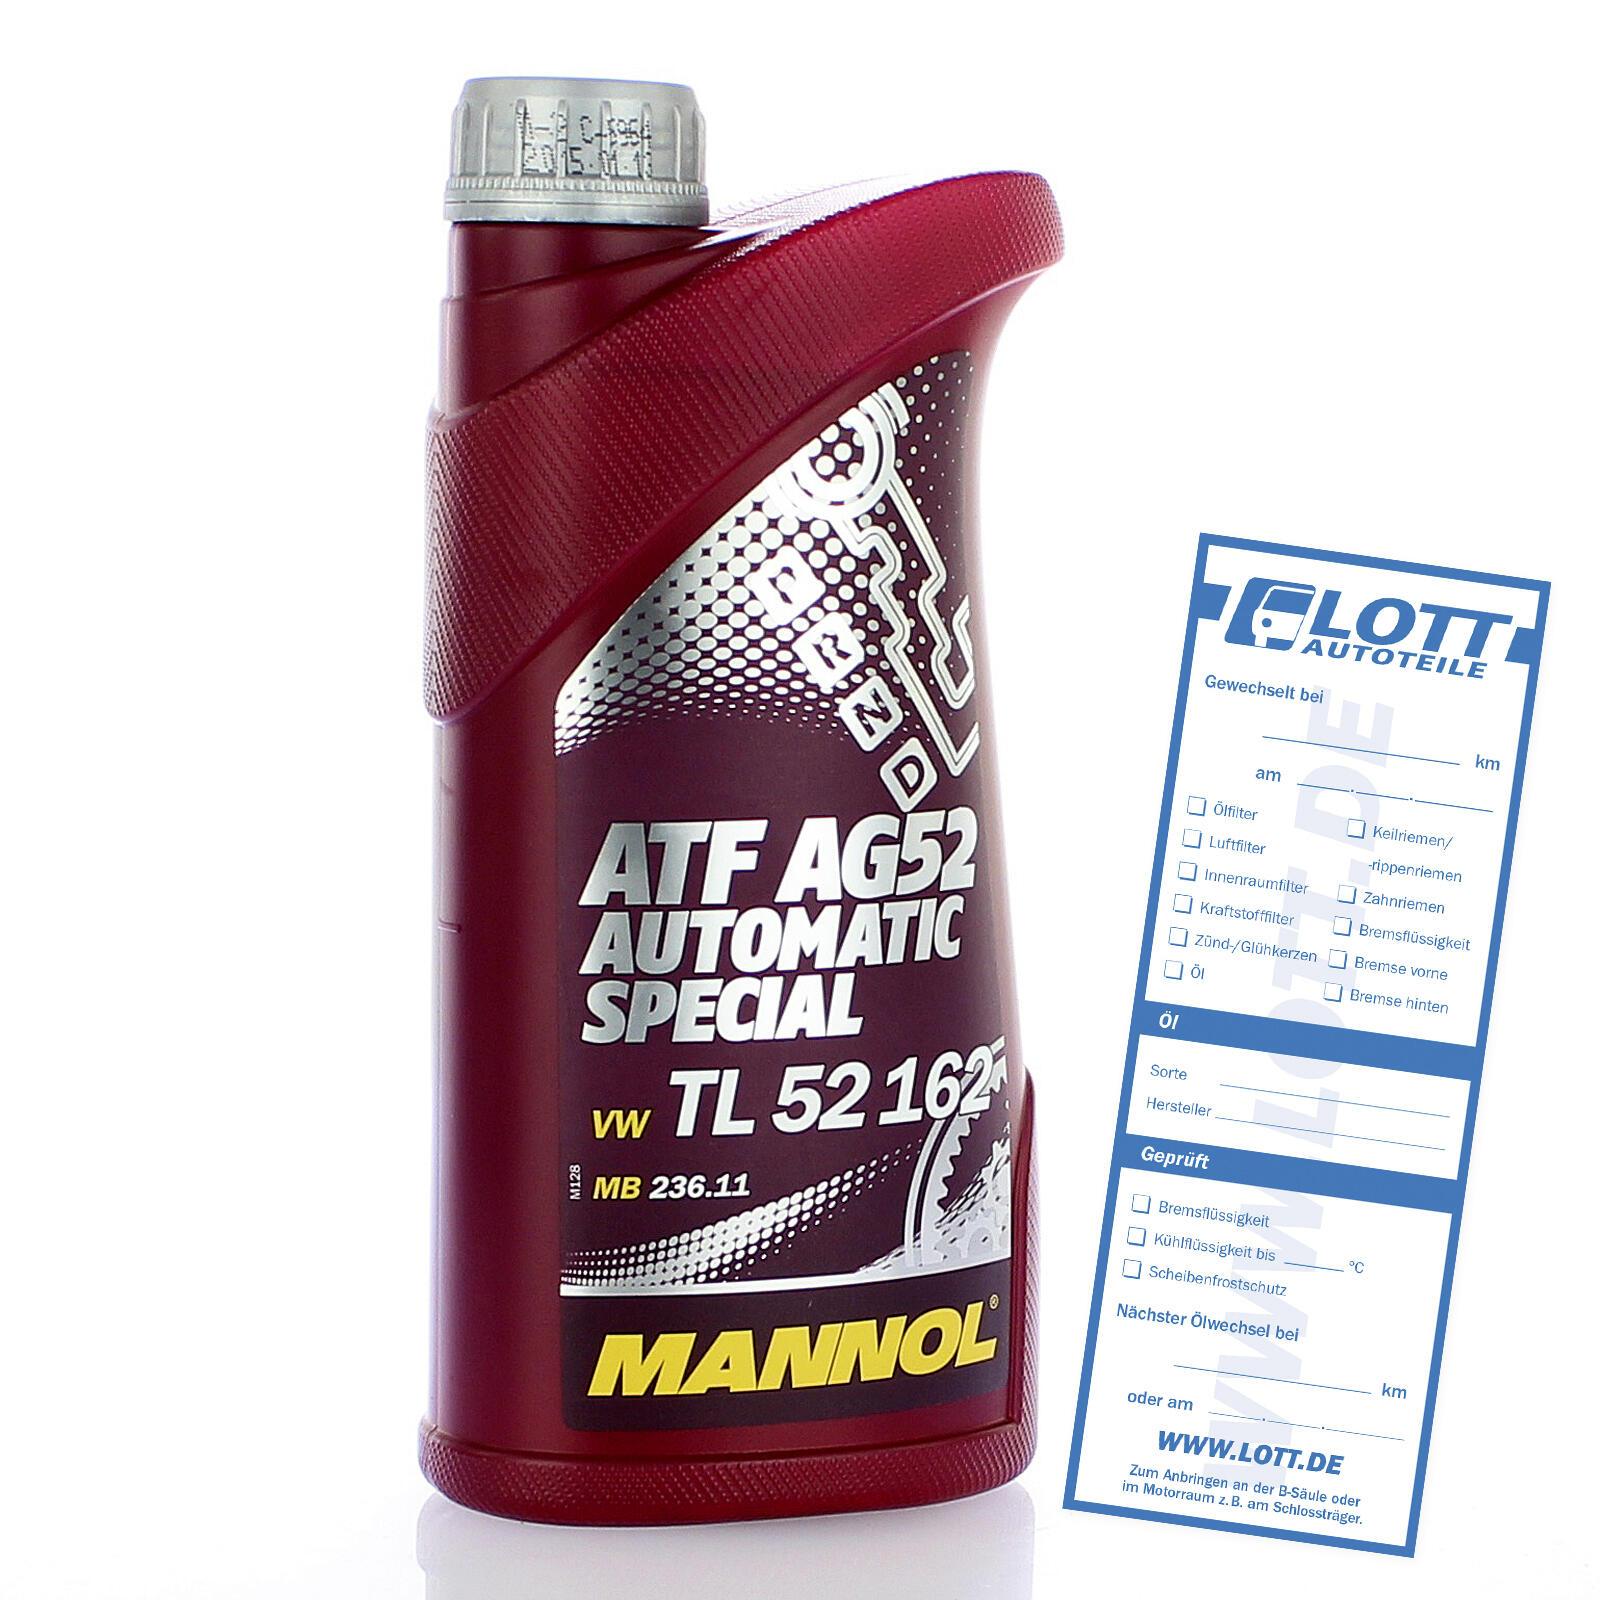 MANNOL ATF AG52 Automatic Special Getriebeöl 1 Liter